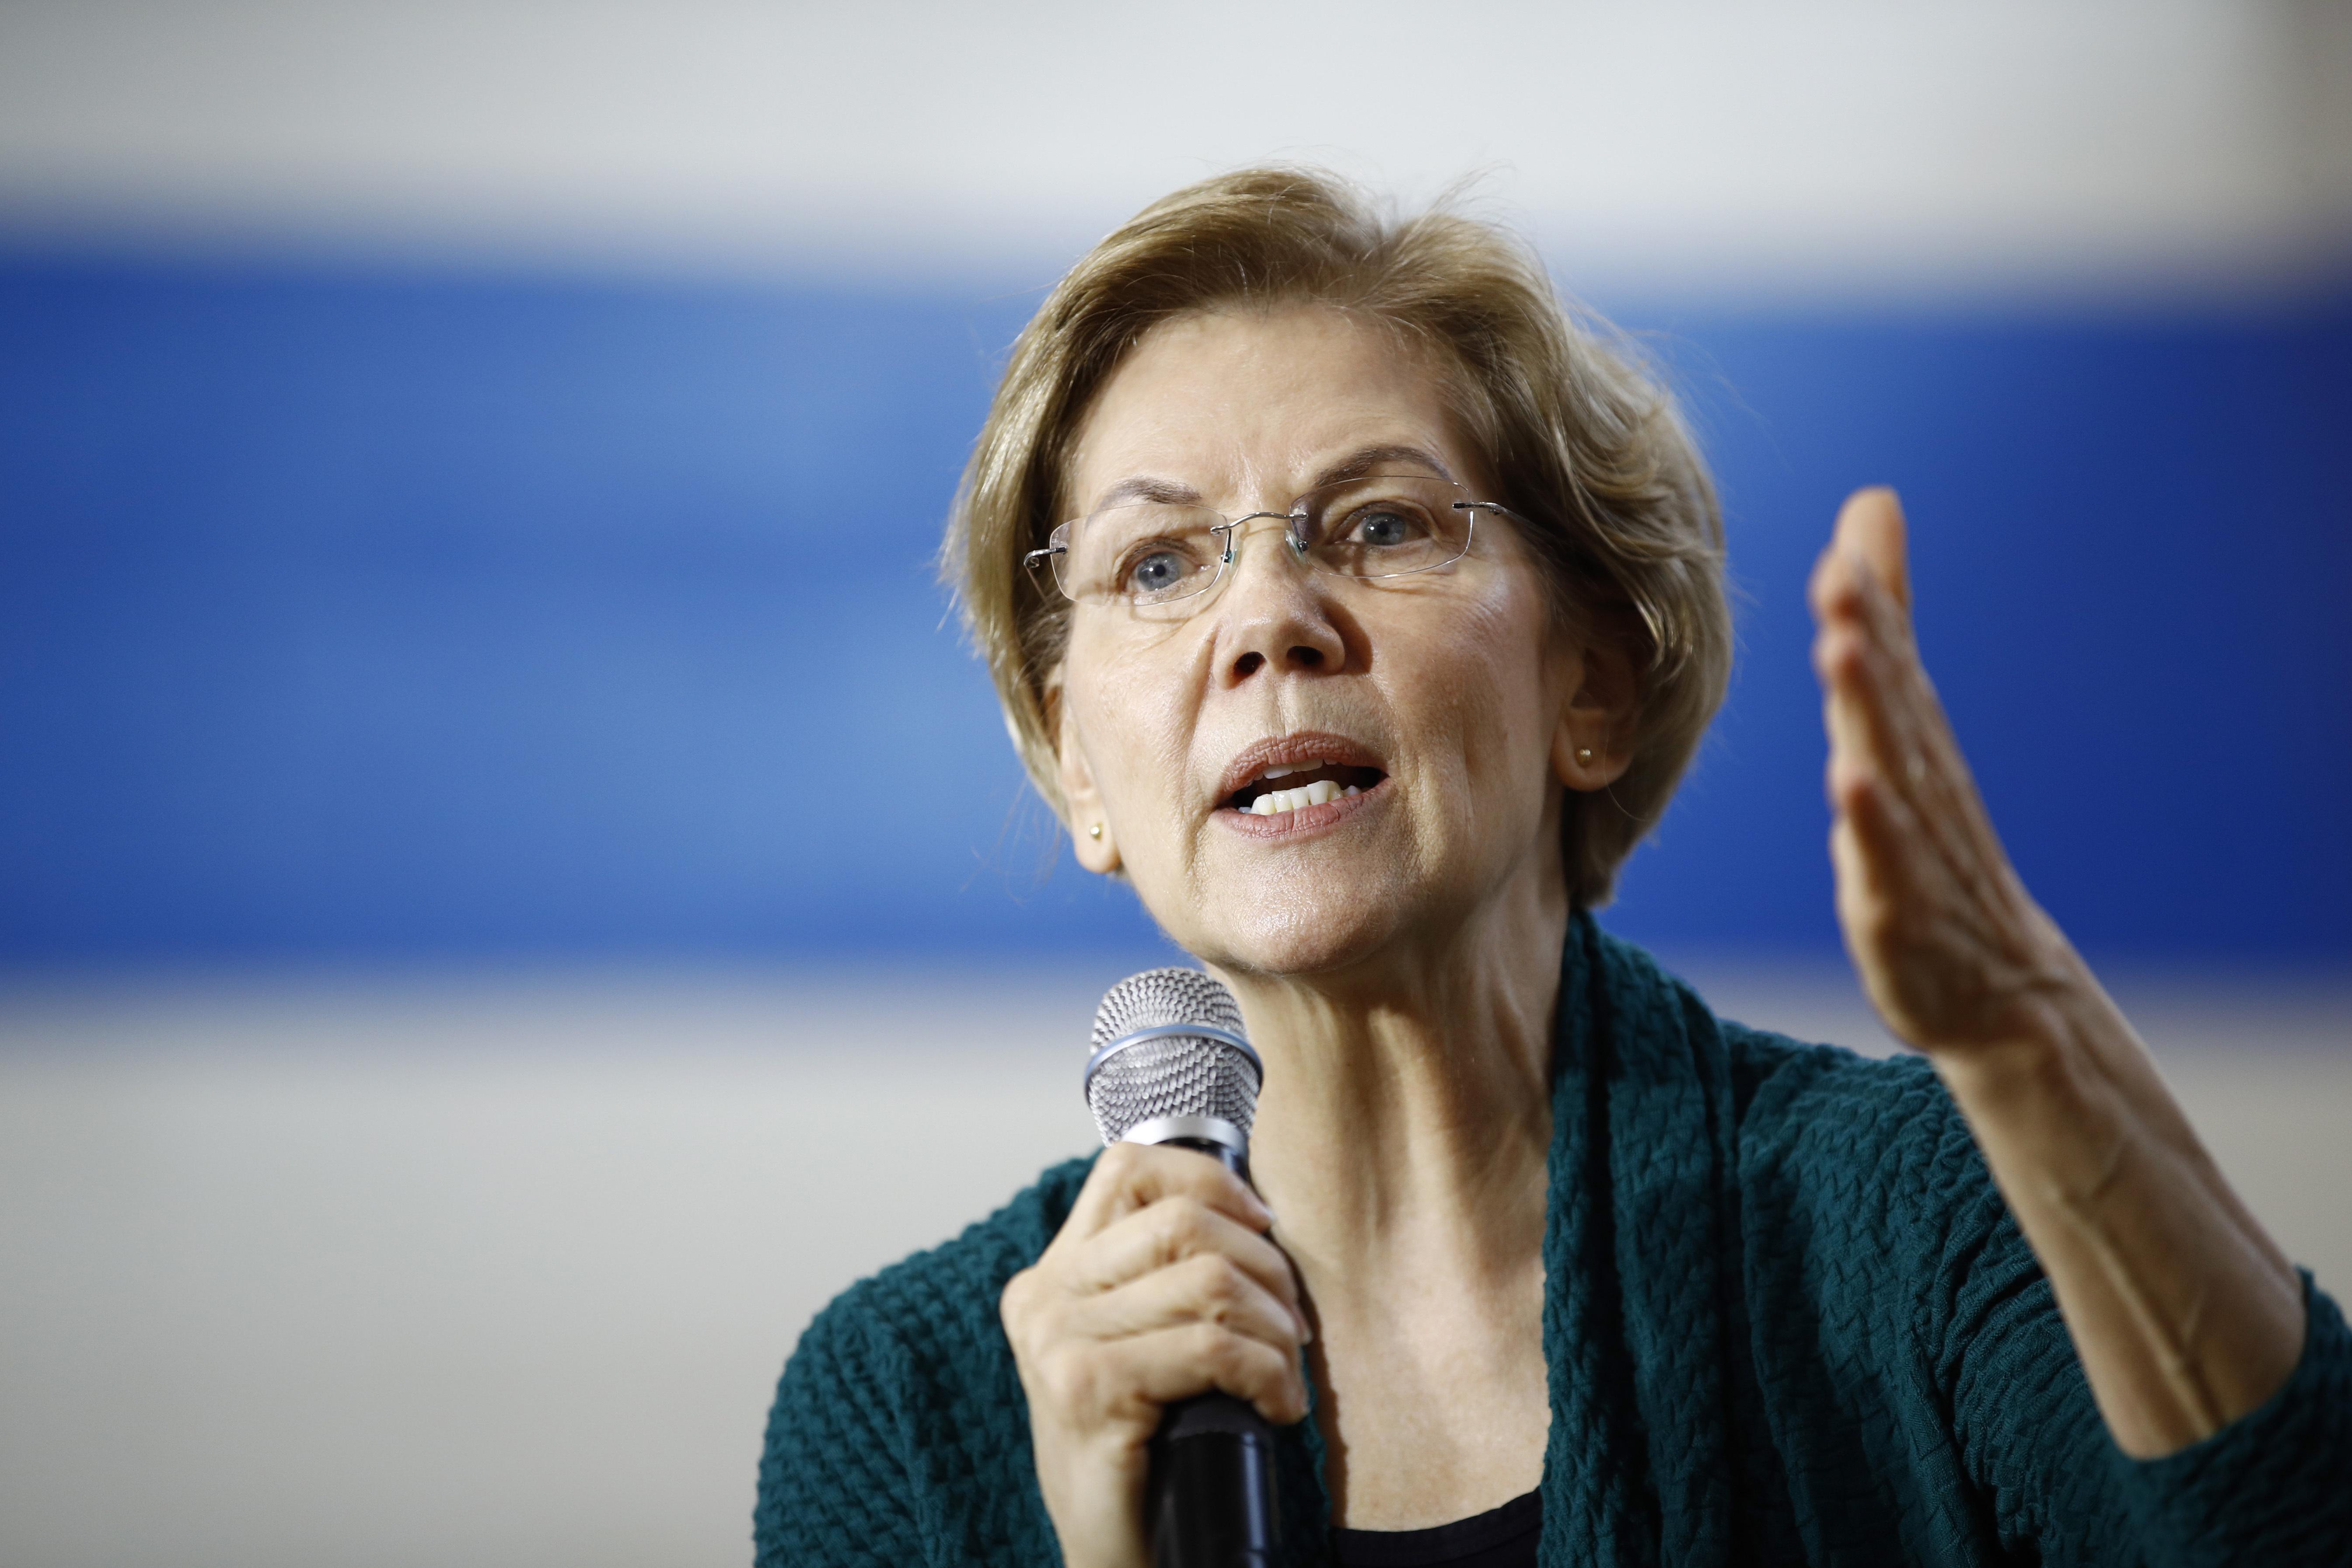 Elizabeth Warren asks Brazil to drop charges against Glenn Greenwald, slams 'state retaliation'